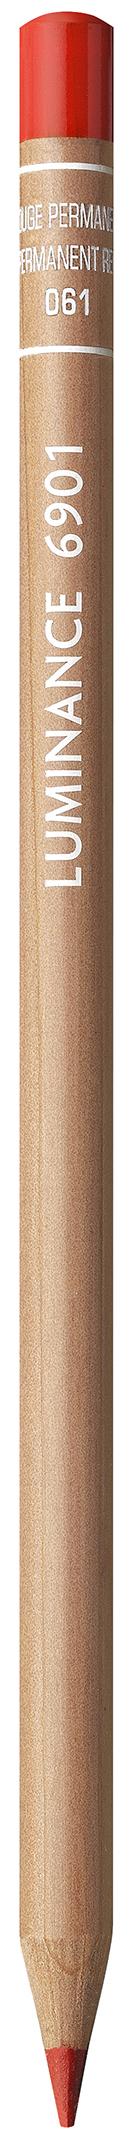 Luminance 6901 Pencil Carandache